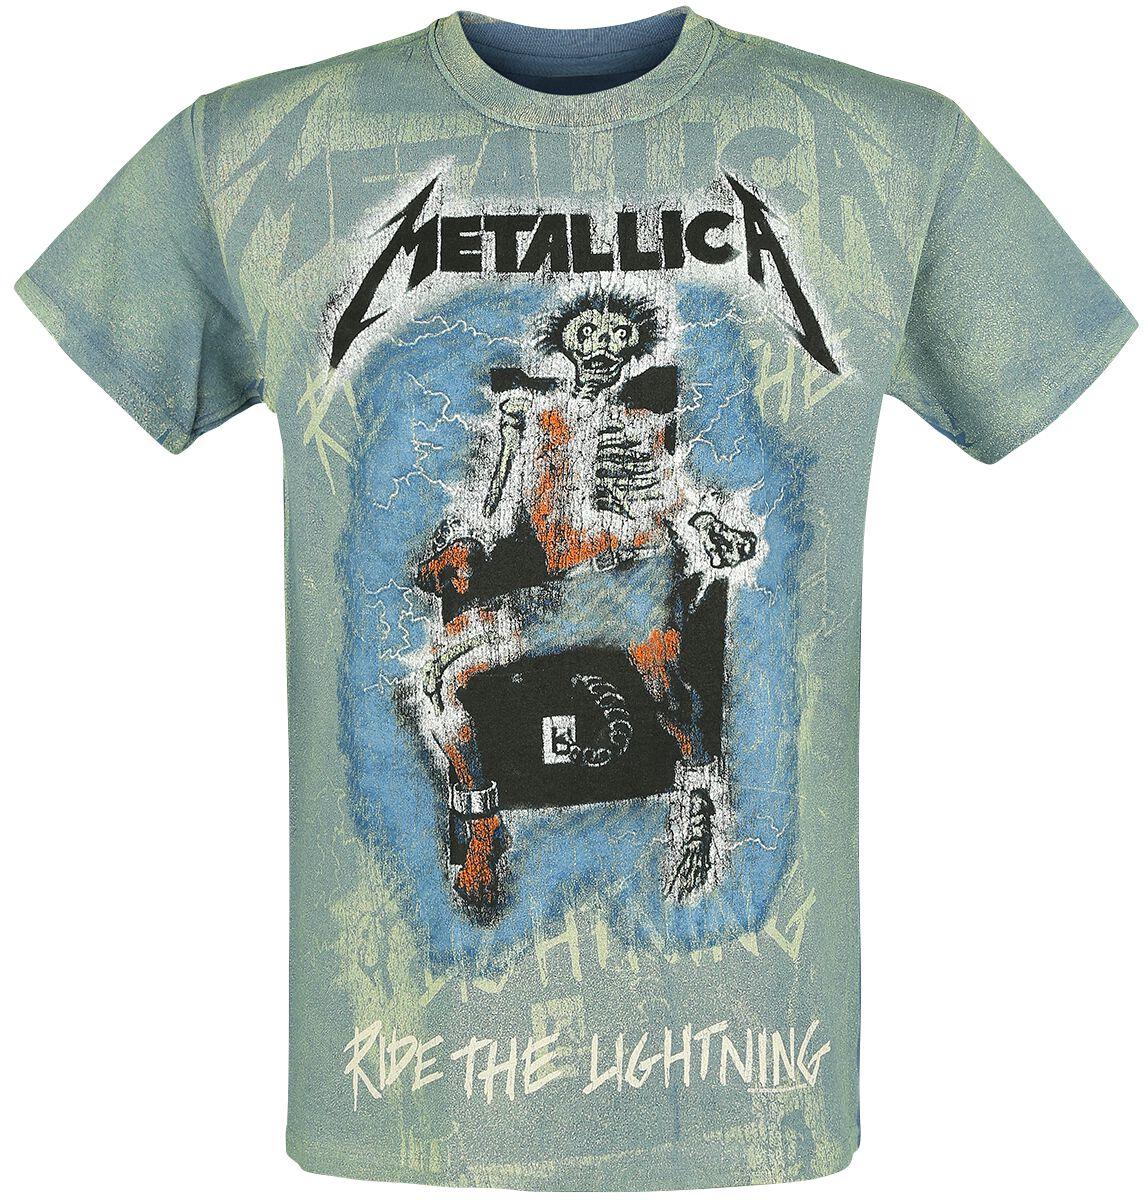 Metallica Ride The Lighting - Allover - Männer - blau